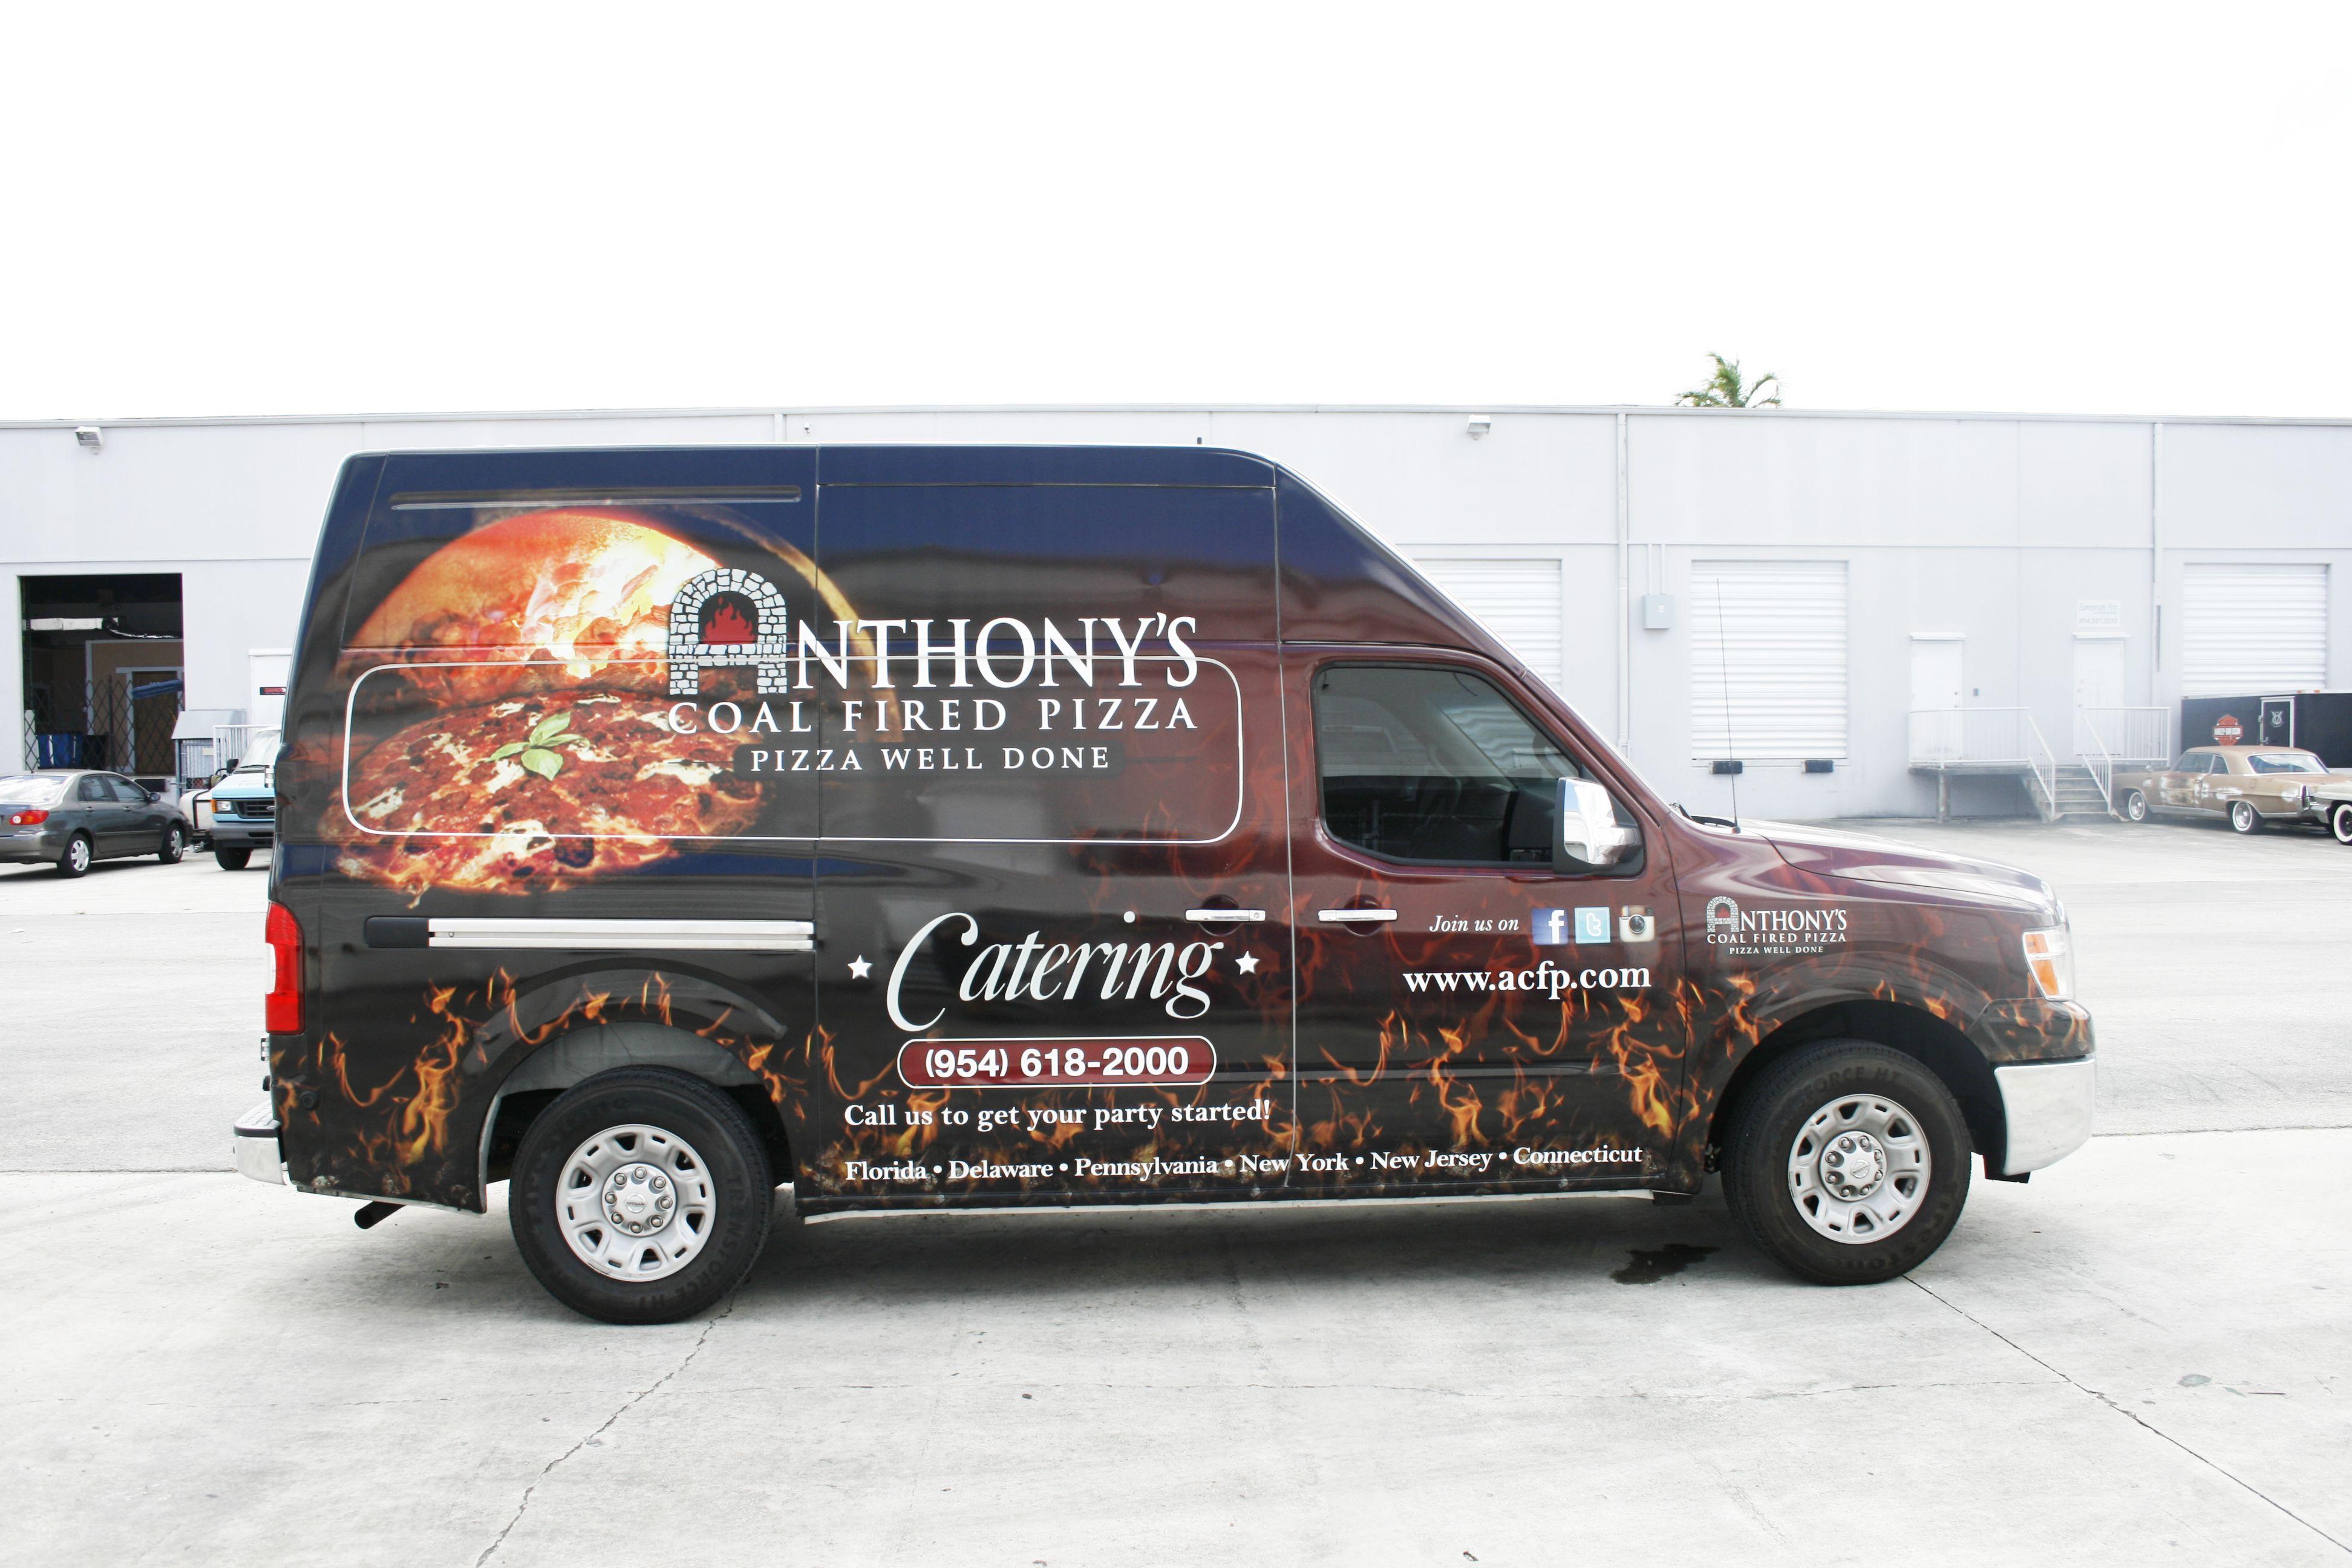 Nissan NV van vehicle wrap Fort Lauderdale Florida for